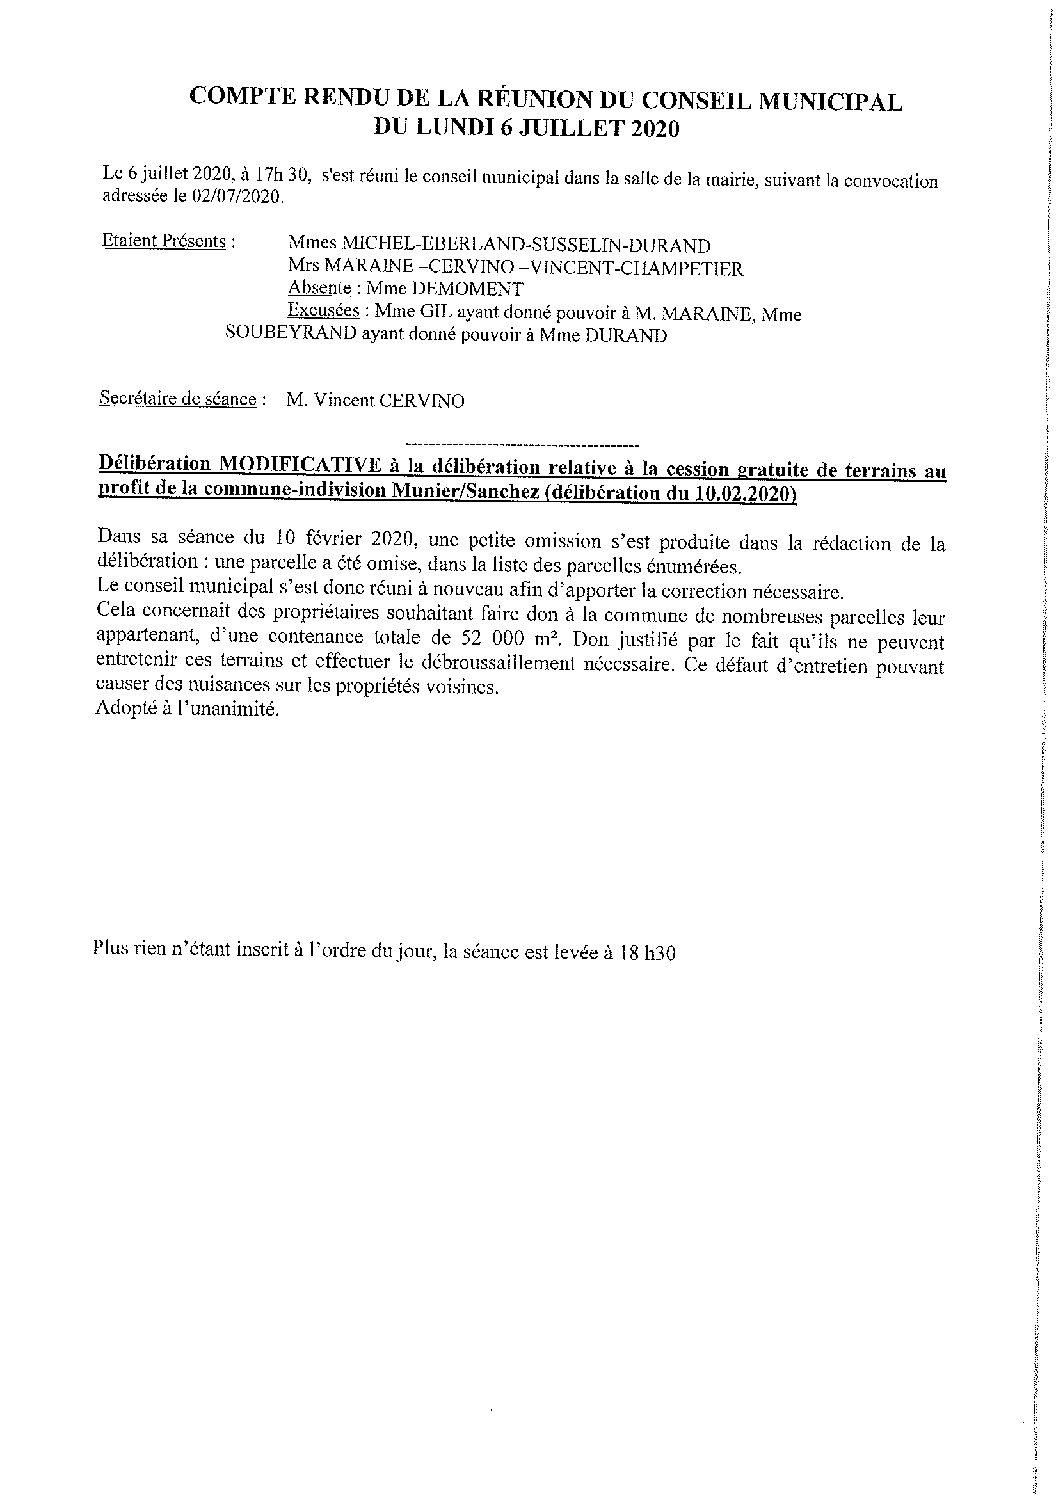 CR du conseil municipal du 06.07.2020